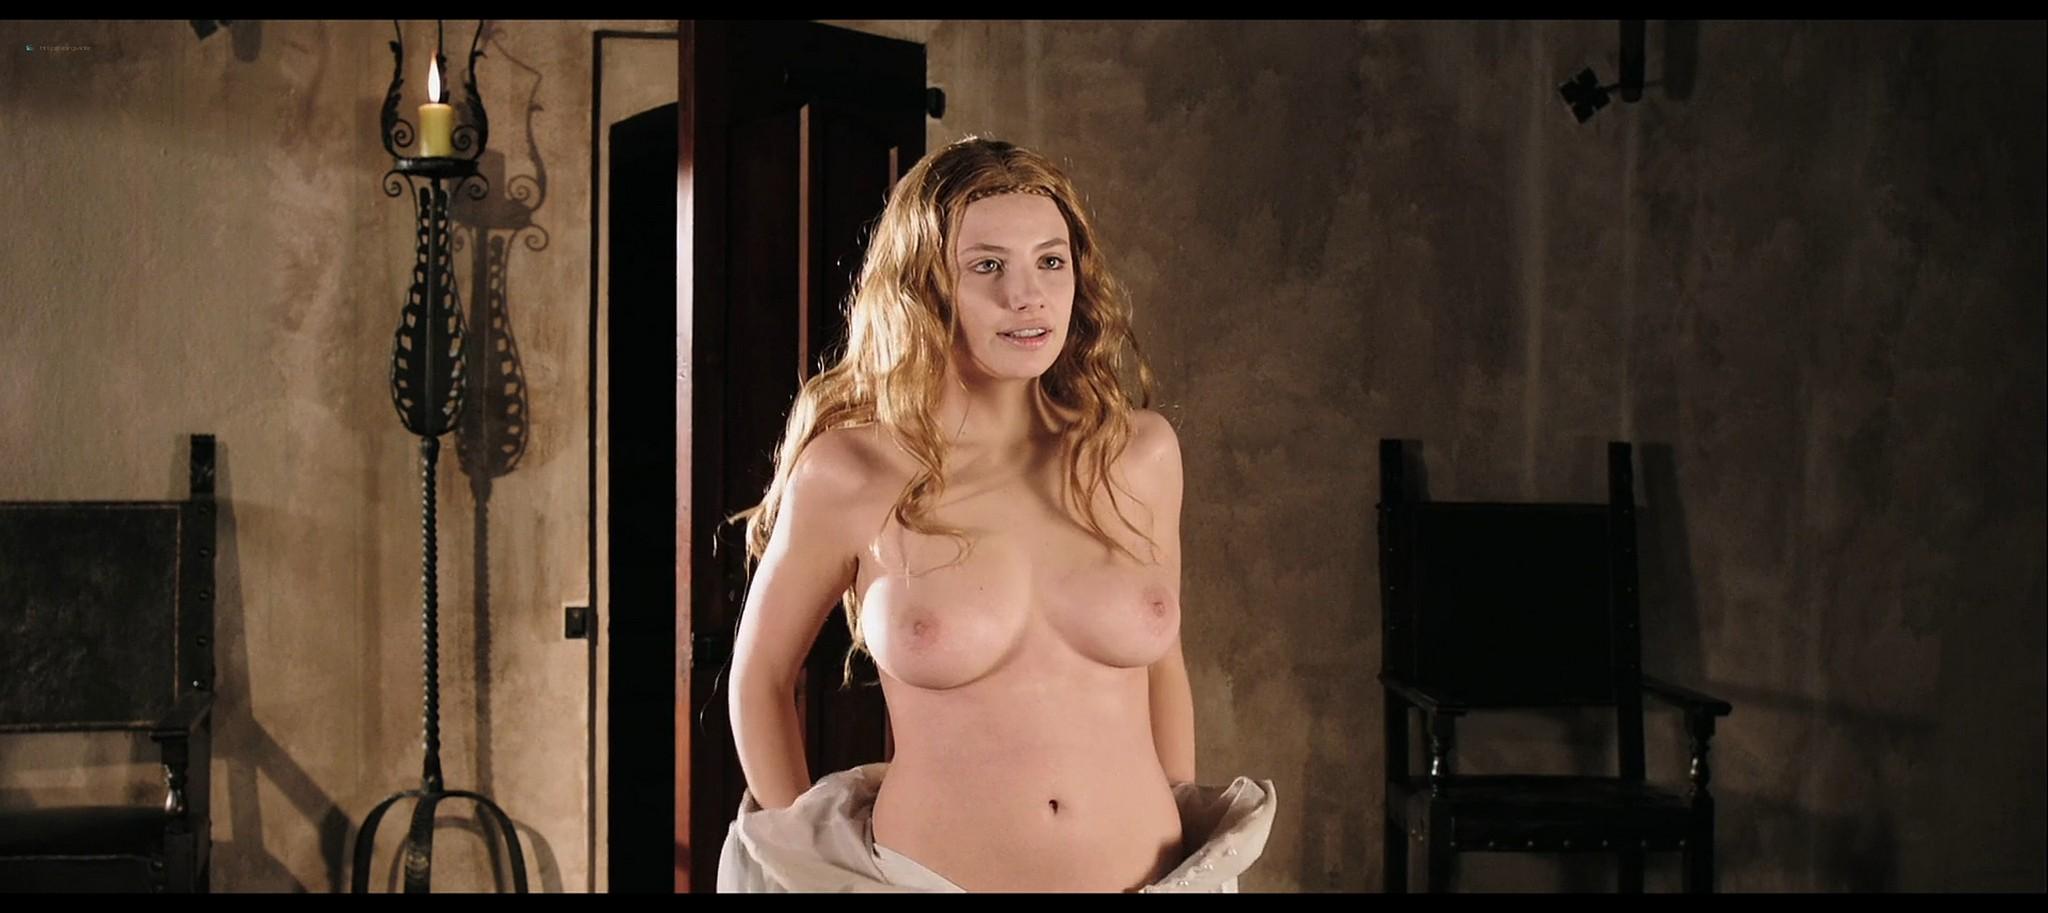 Asia Argento nude and Miriam Giovanelli nude in Darios Argento Dracula 3d 2012 HD 1080p BluRay 7